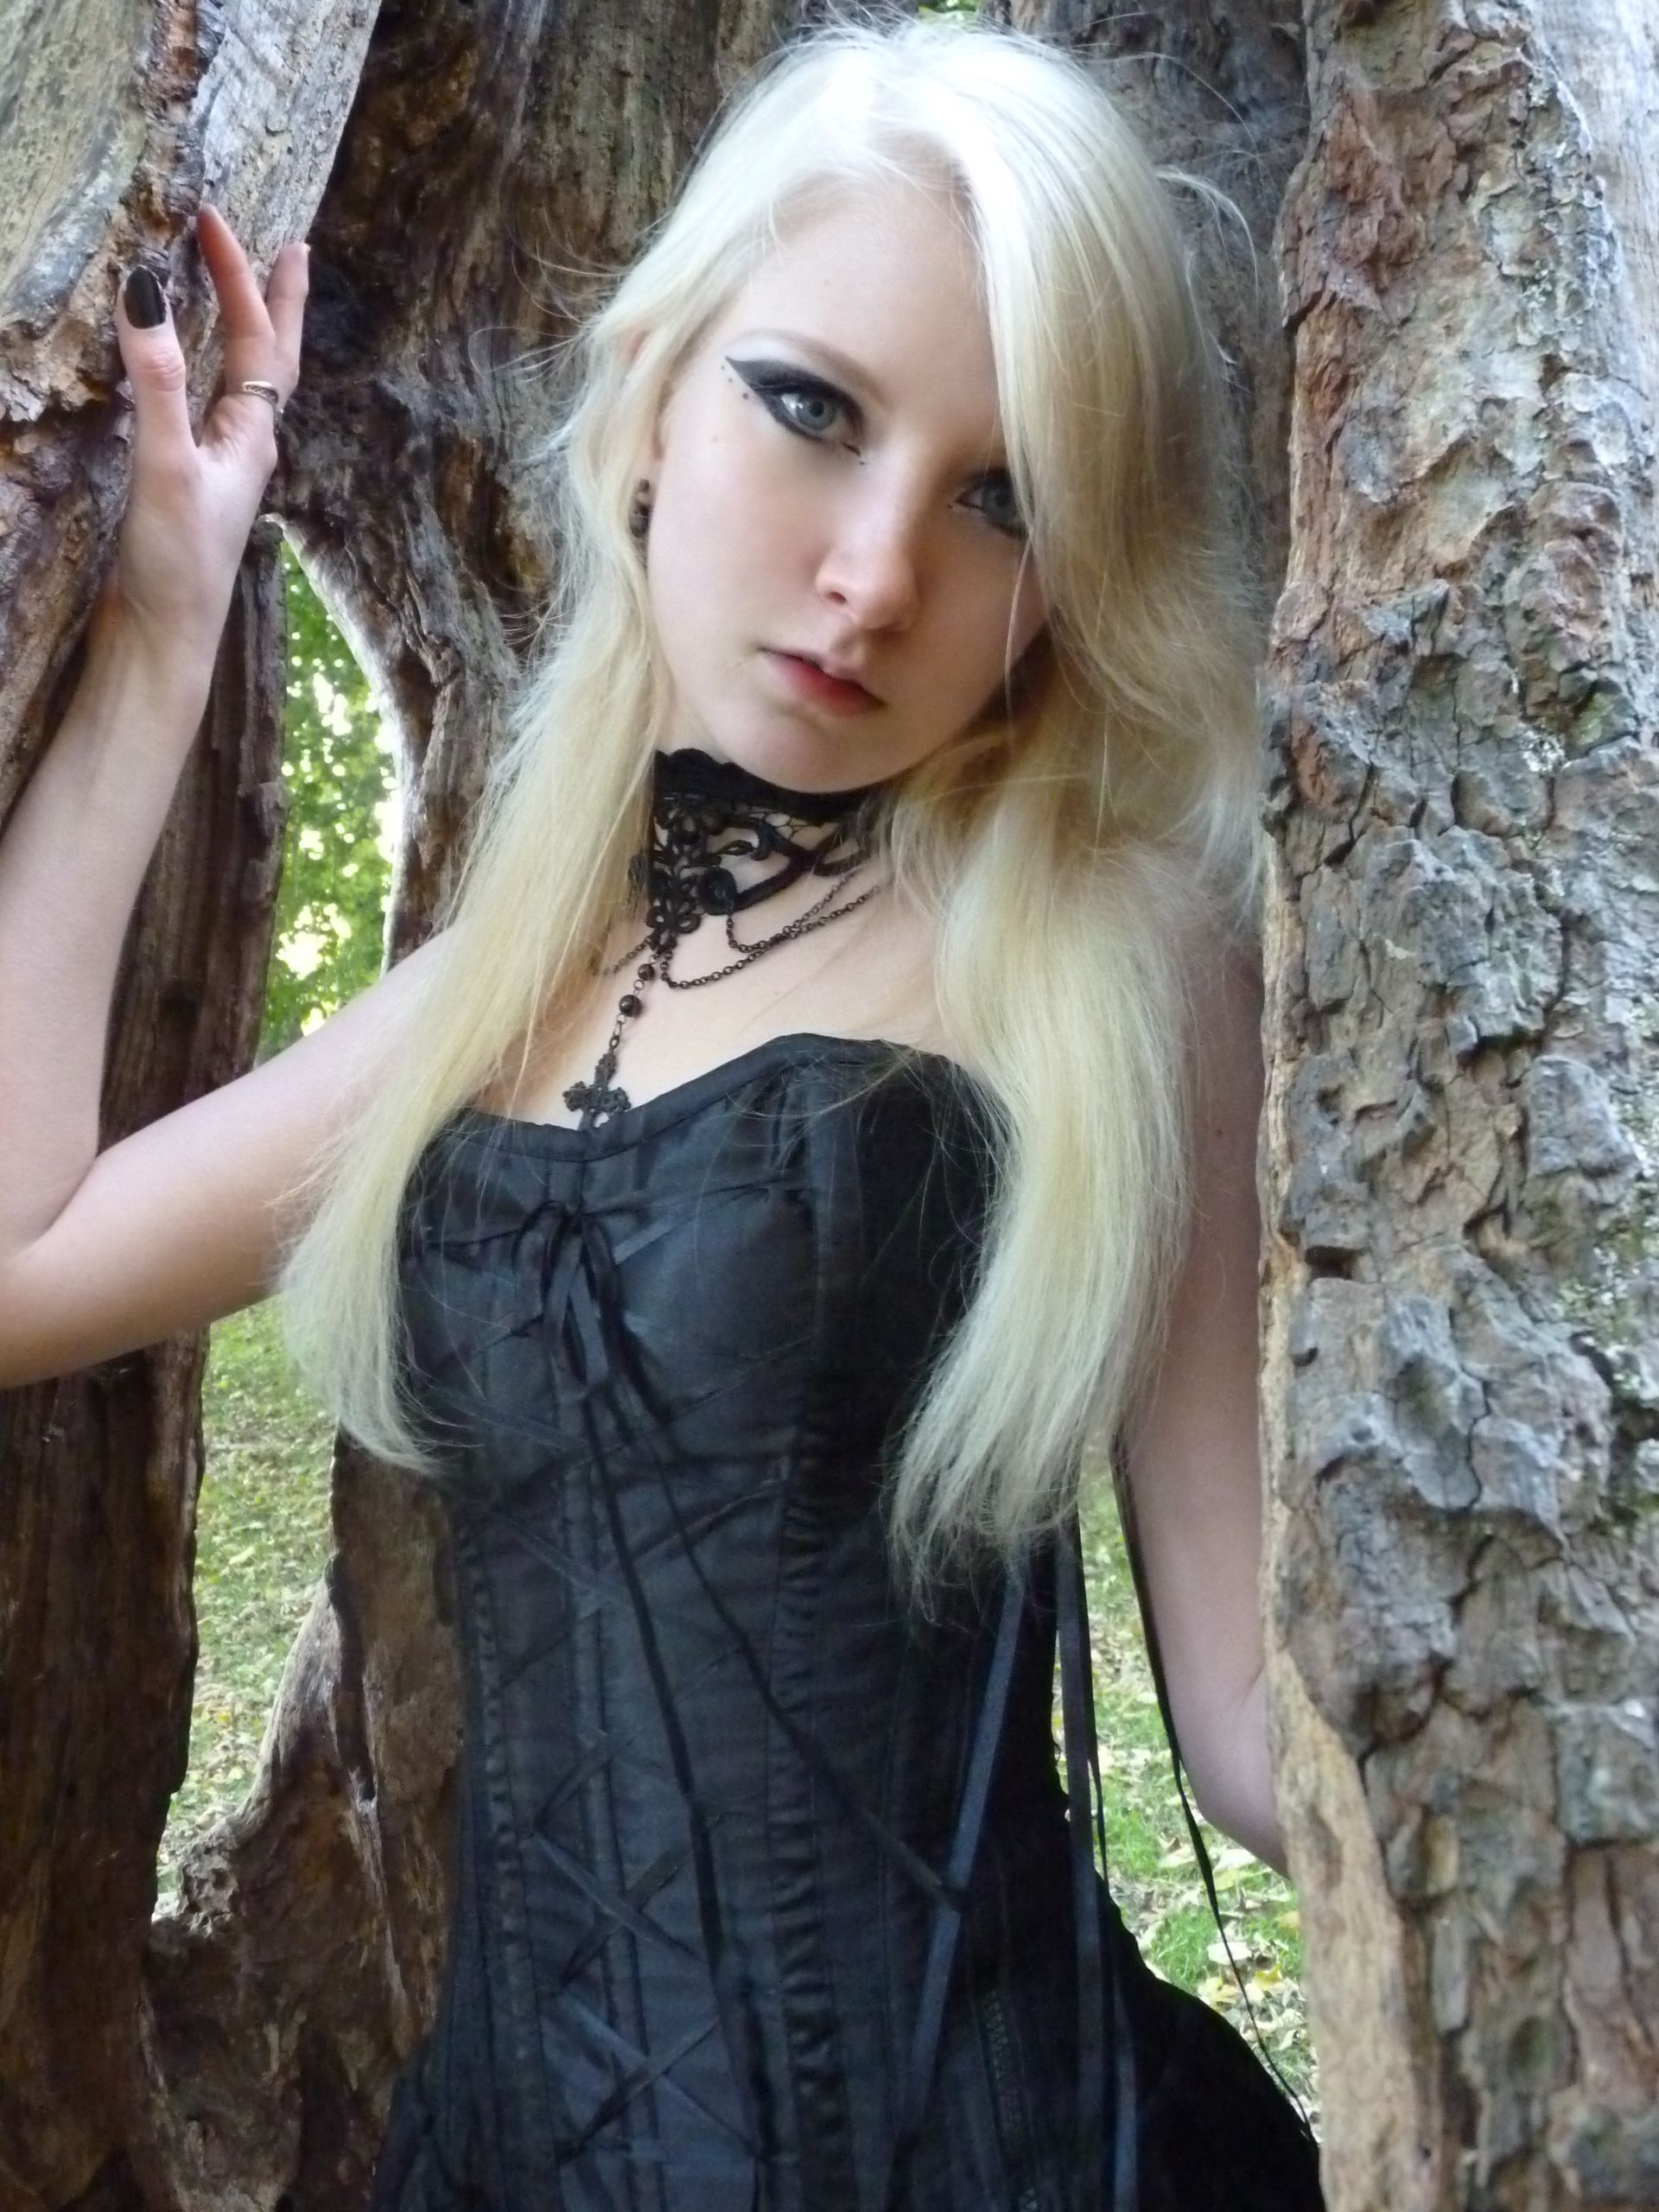 Goth stock photo by MariaAmandaviantart on deviantART